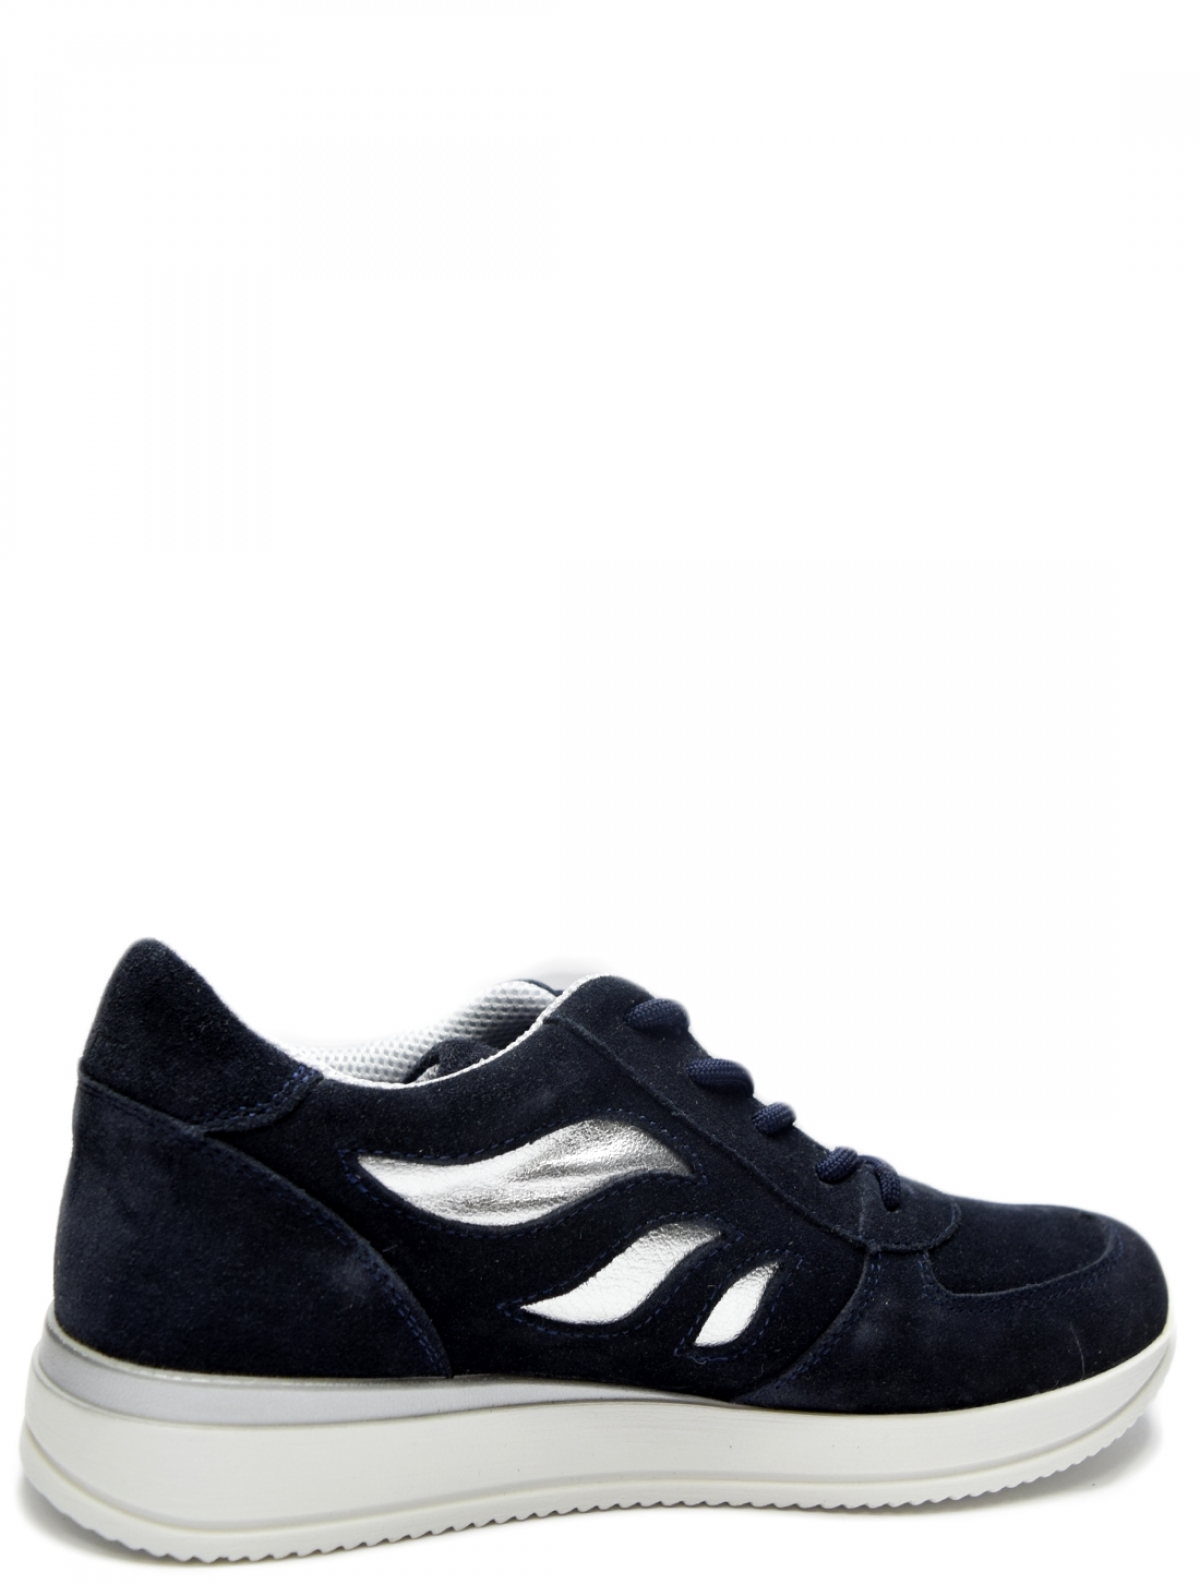 Fanno Fatti 24ст-0258-4сн женские кроссовки